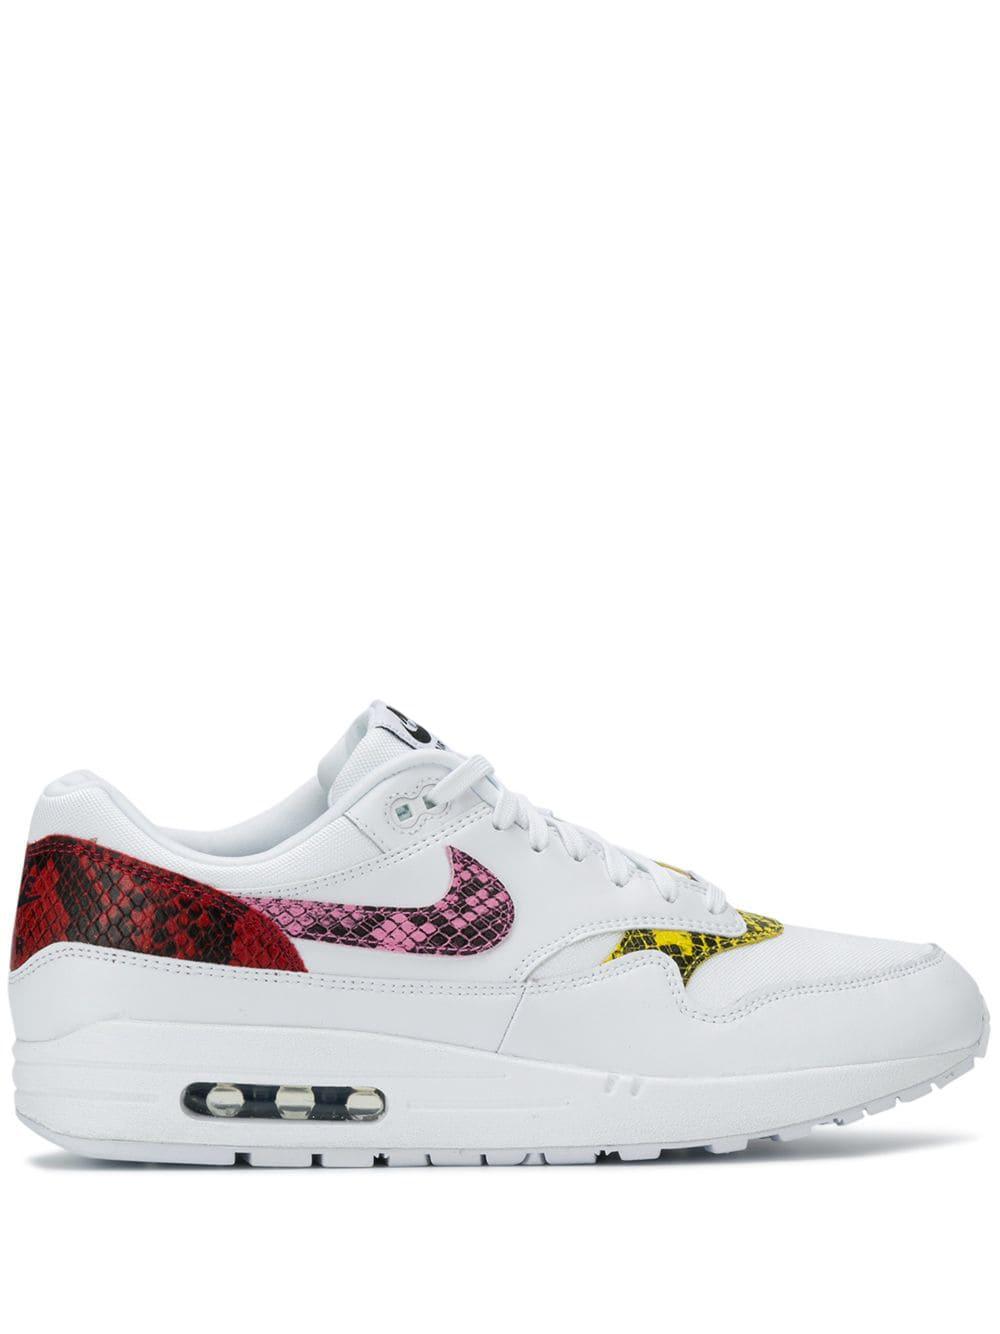 Nike Air Max 1 Premium Animal Sneakers - White